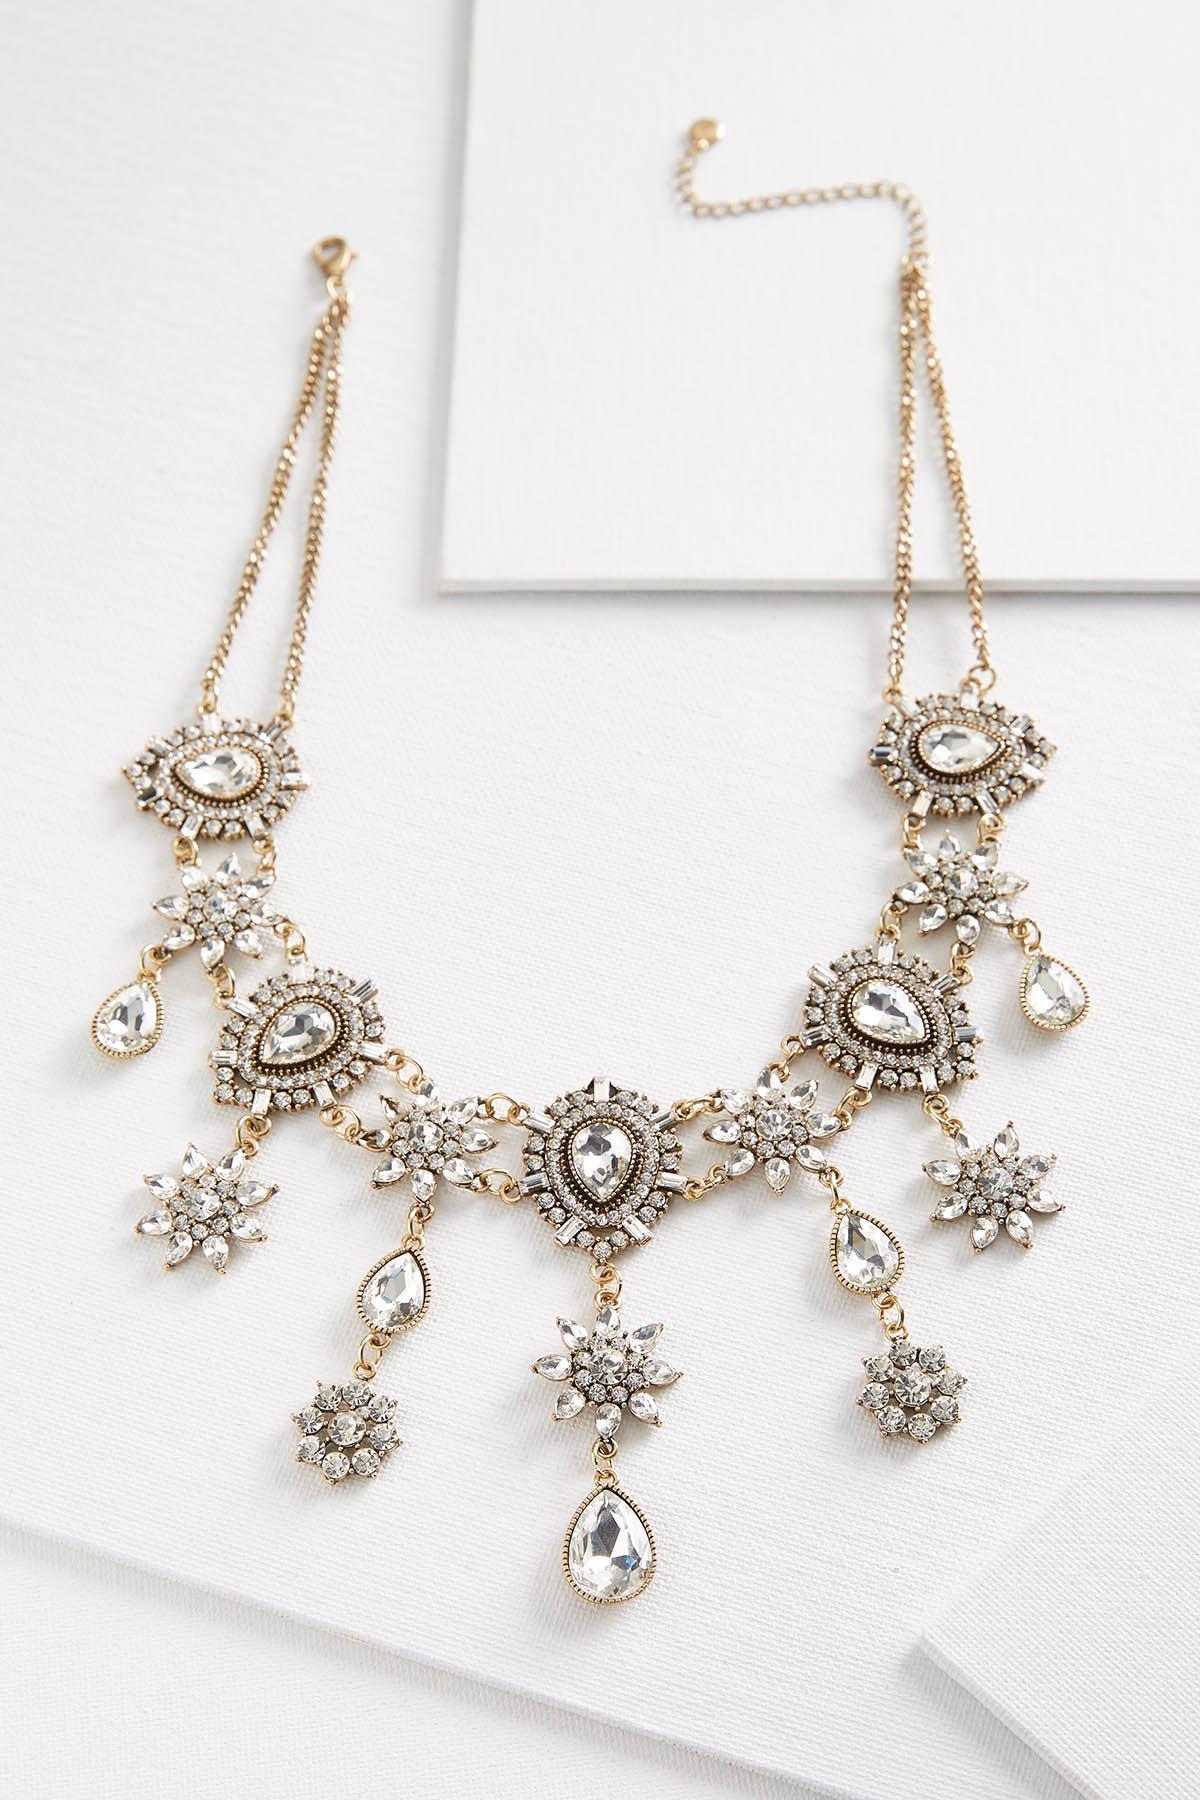 Fit For A Princess Bib Necklace